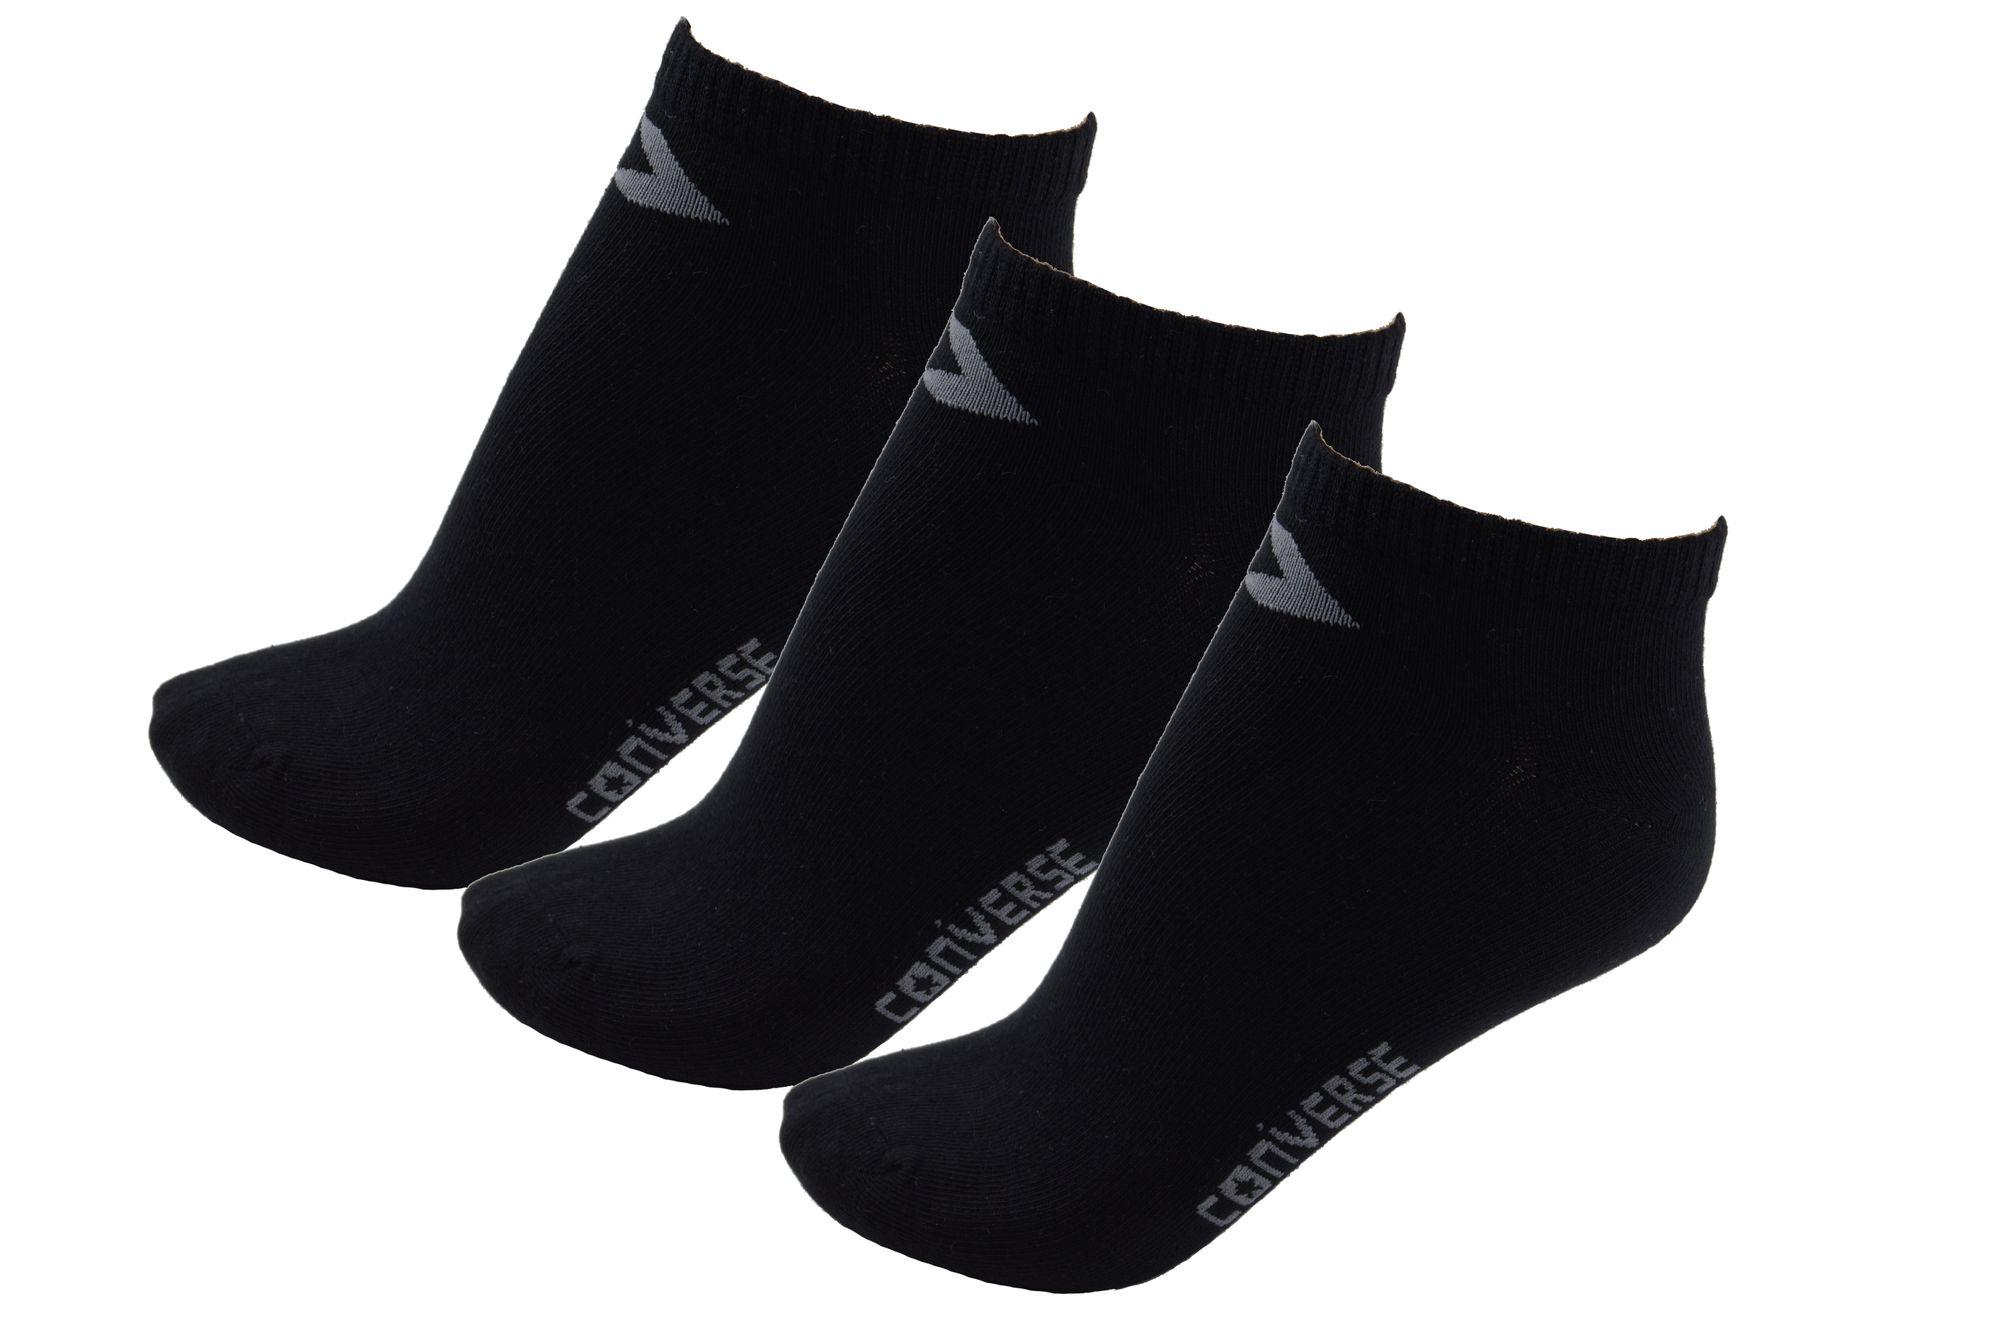 Converse Damen Socken Low Cut 3er Pack Füßlinge Größe 35 38